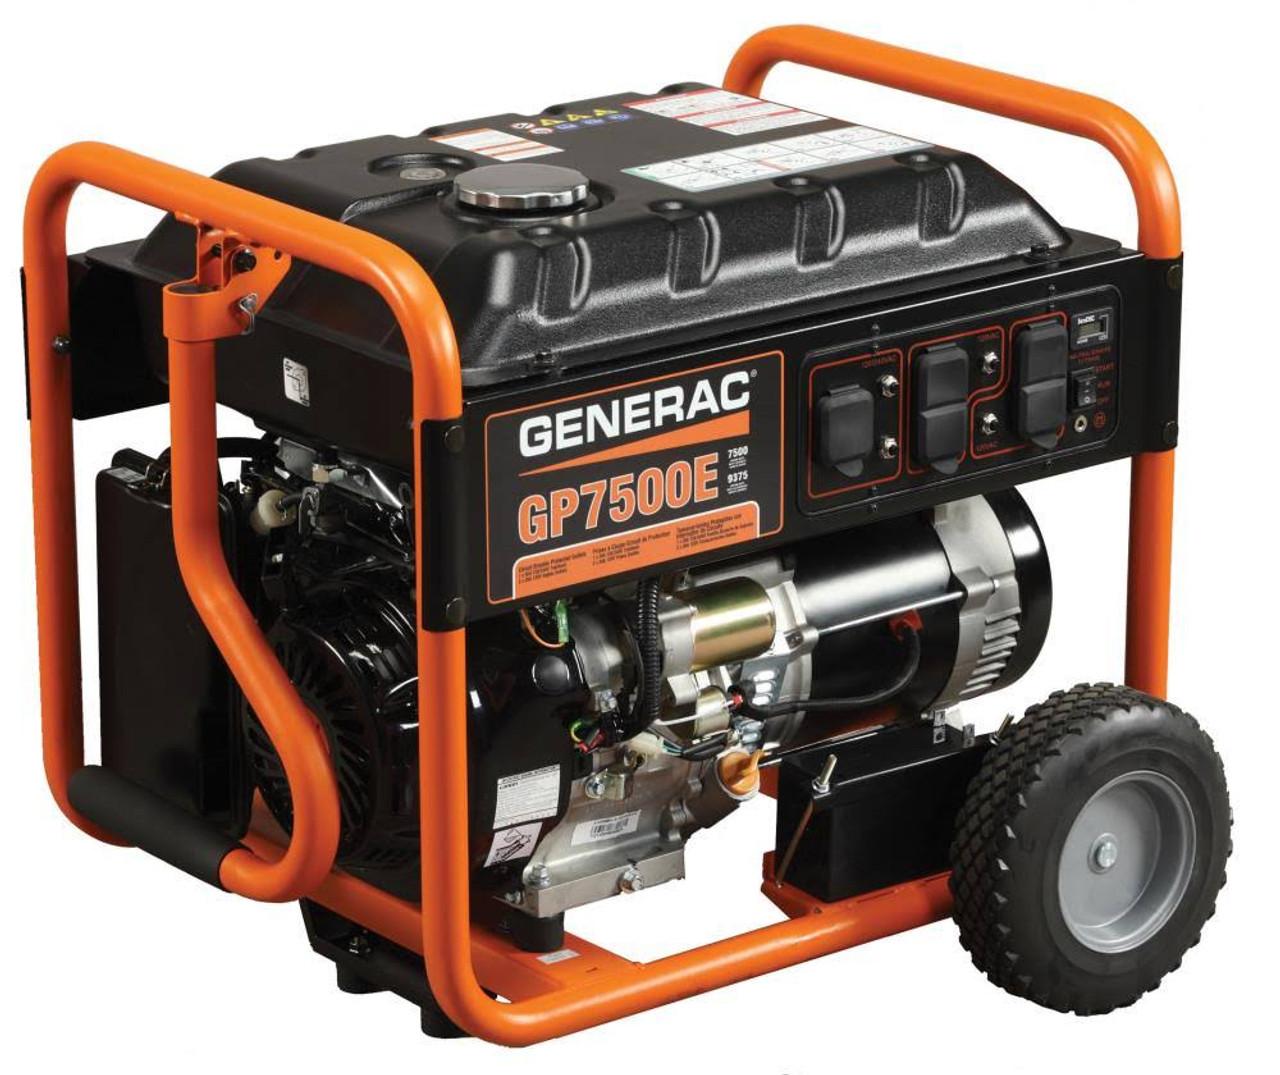 medium resolution of generac 5943 7500 running watts gas powered portable generator carb compliant